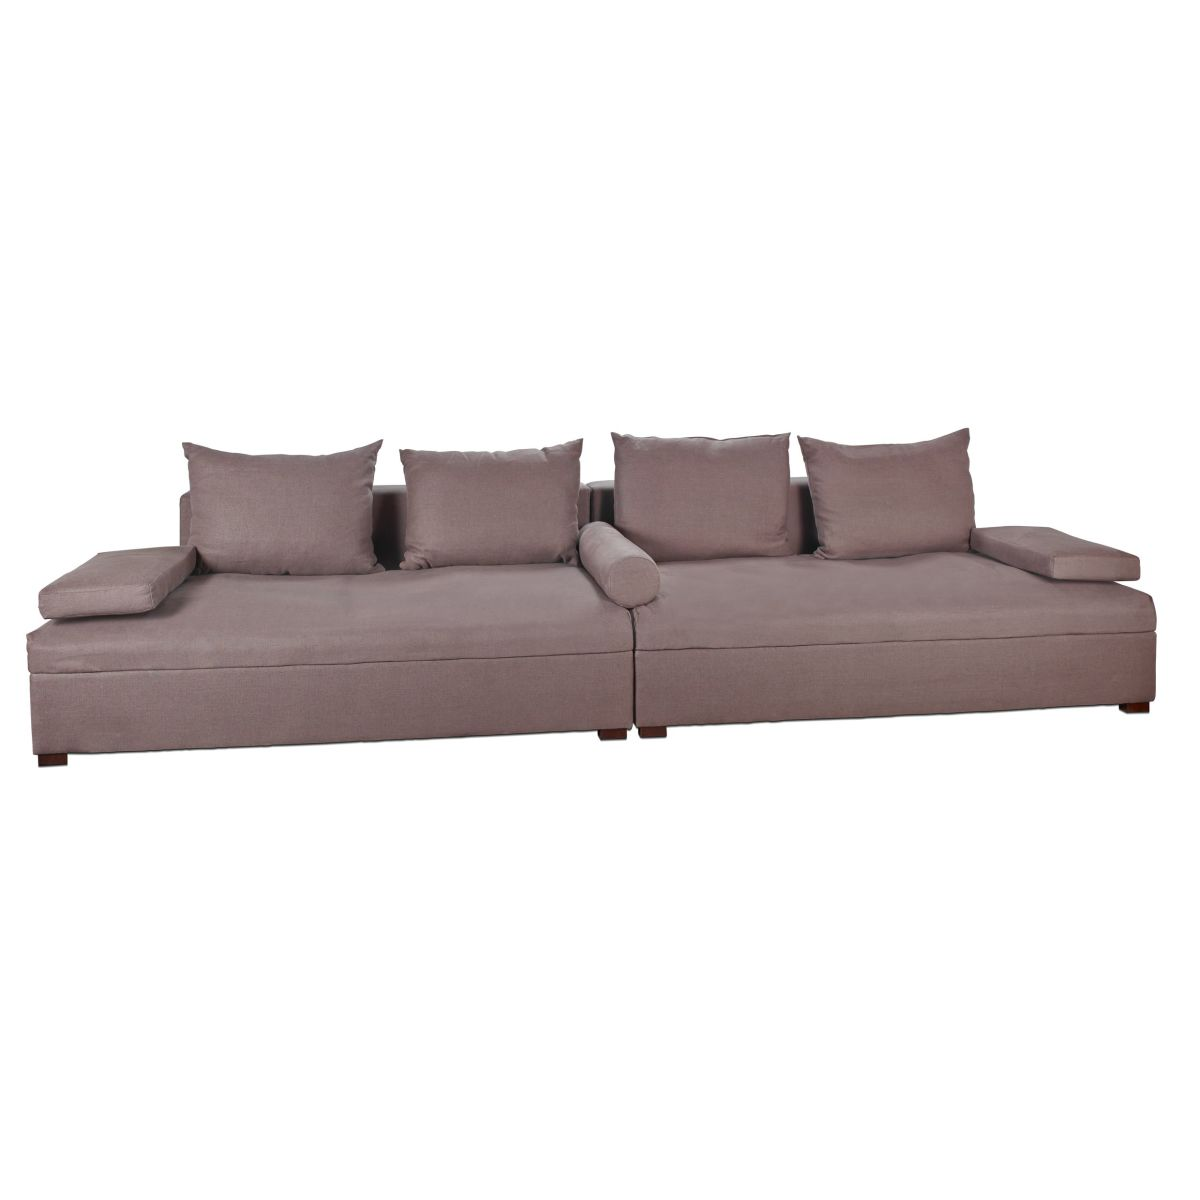 sofa couch online bestellen light grey velvet corner 100 leinen versandkostenfrei moebeldeal